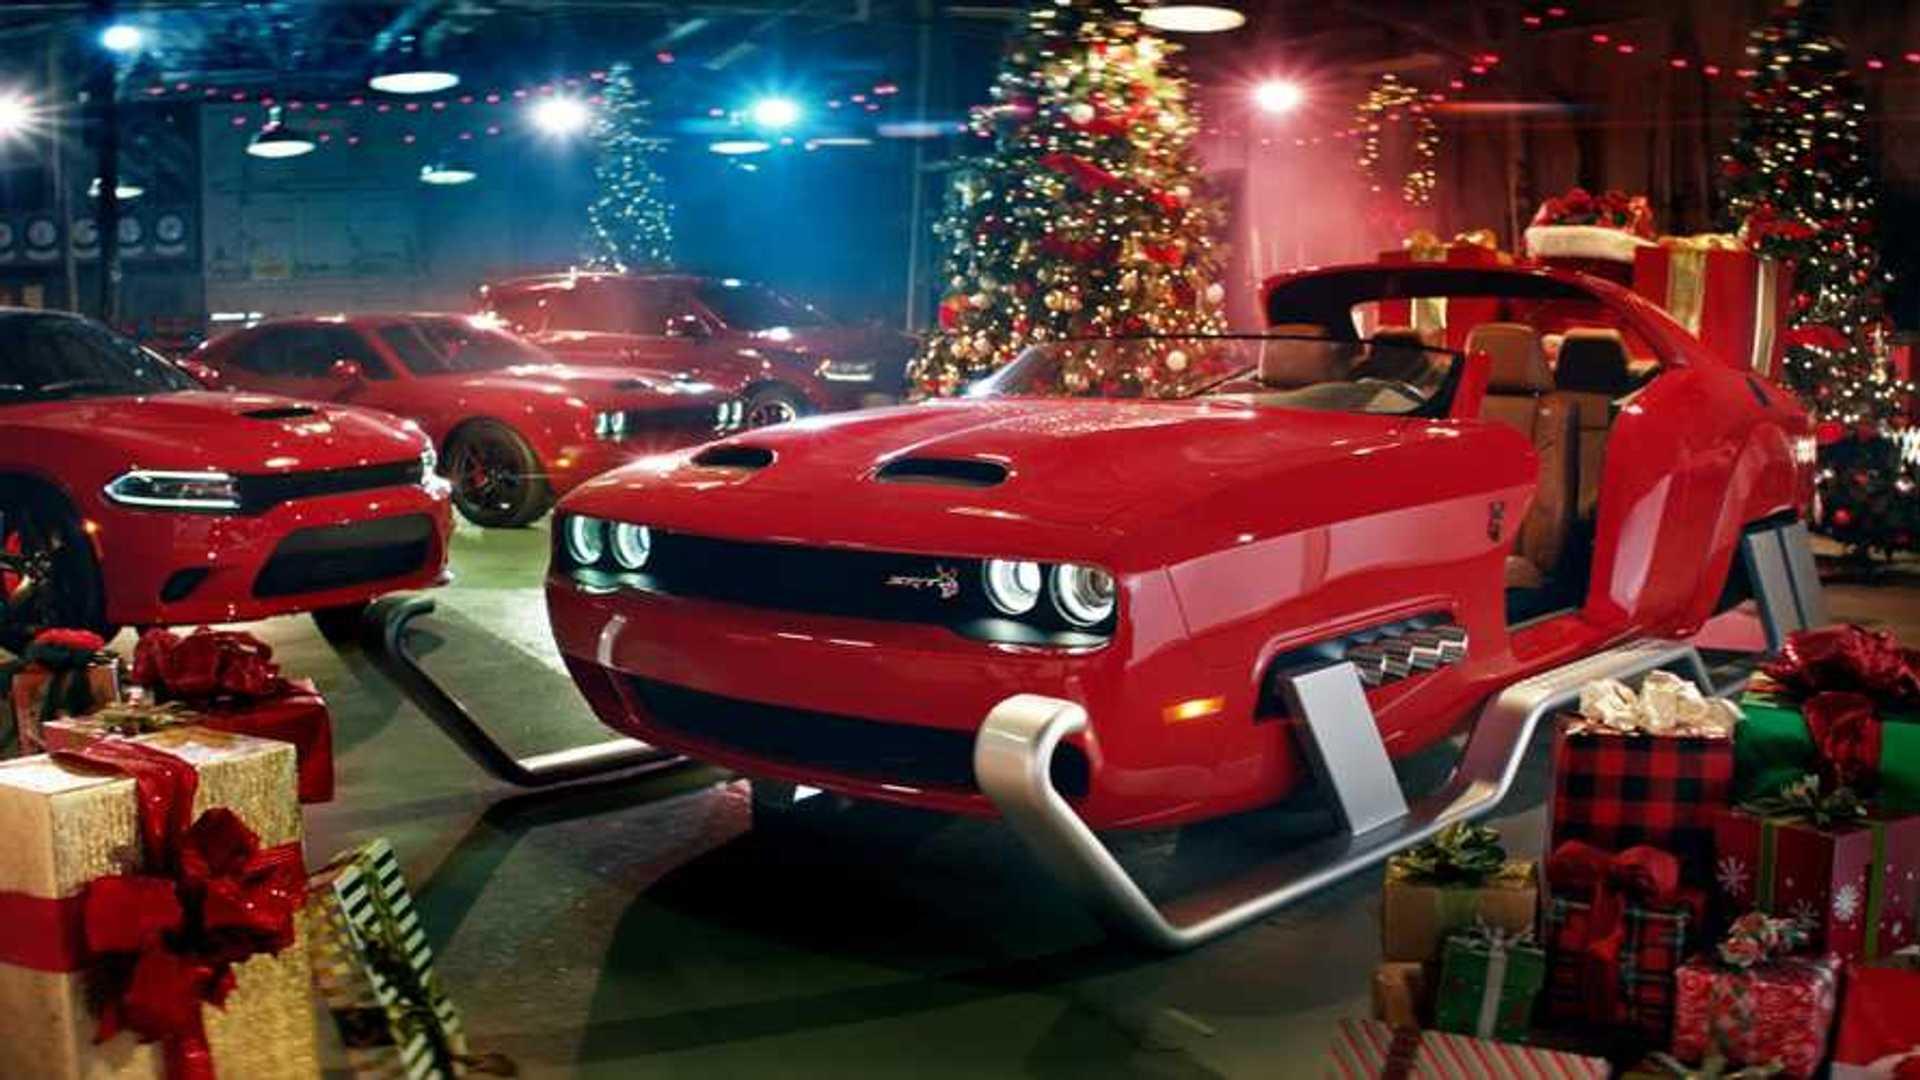 Dodge Challenger SRT Redeye Becomes Santa's New Sleigh